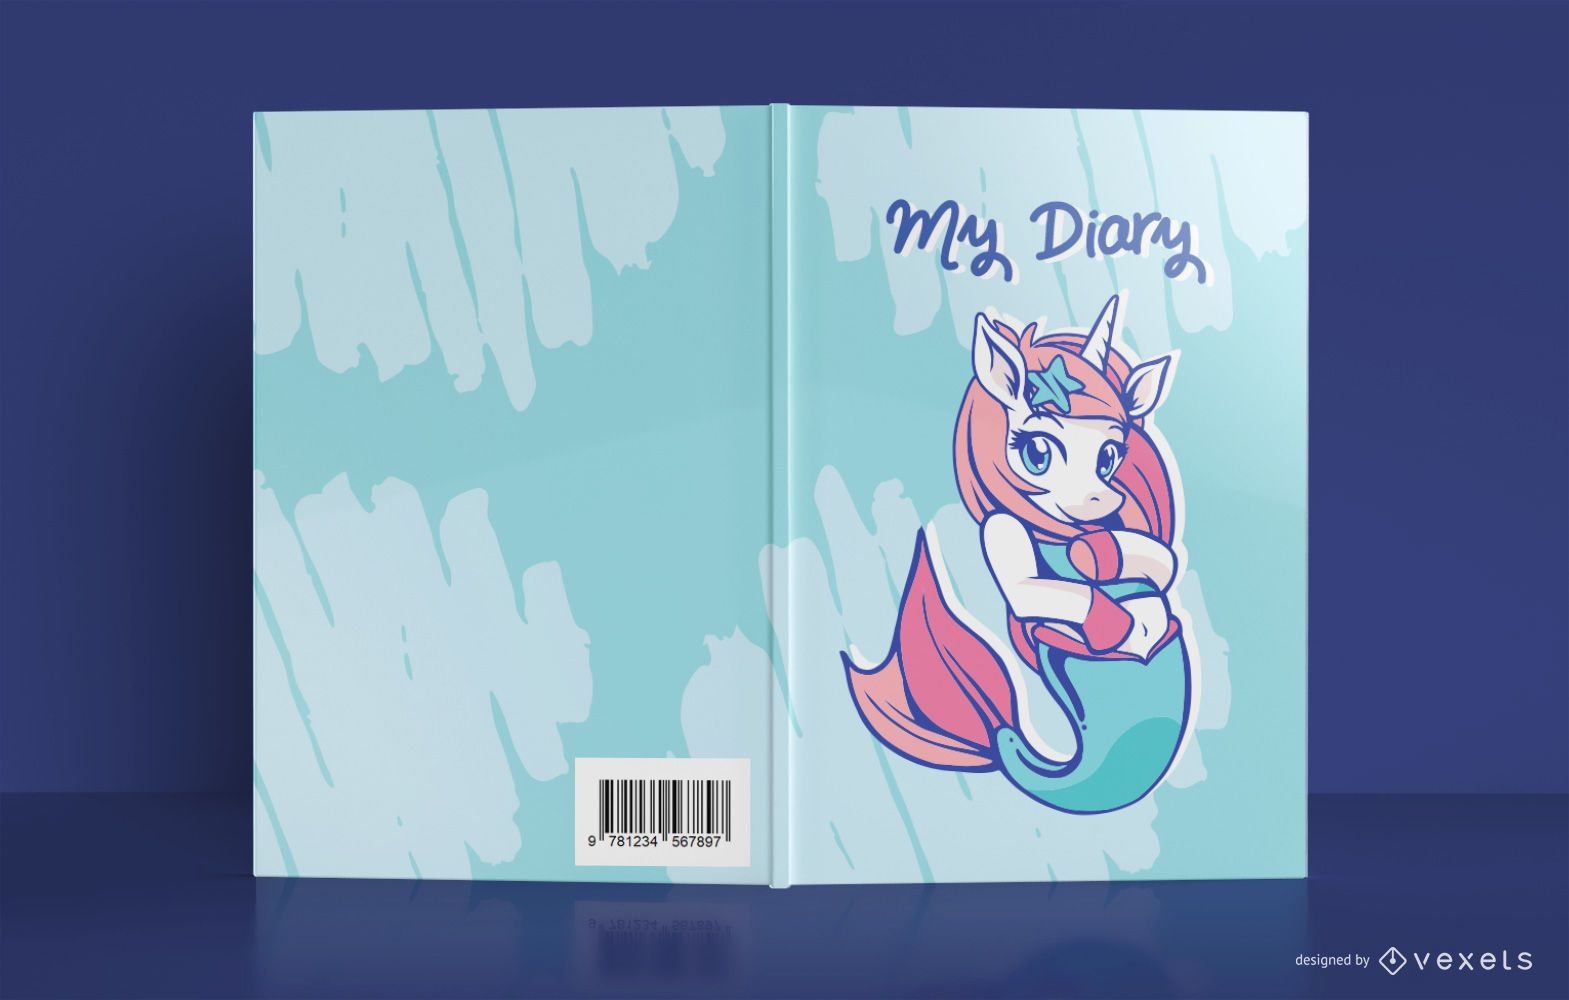 Unicorn Mermaid Diary Cover Design